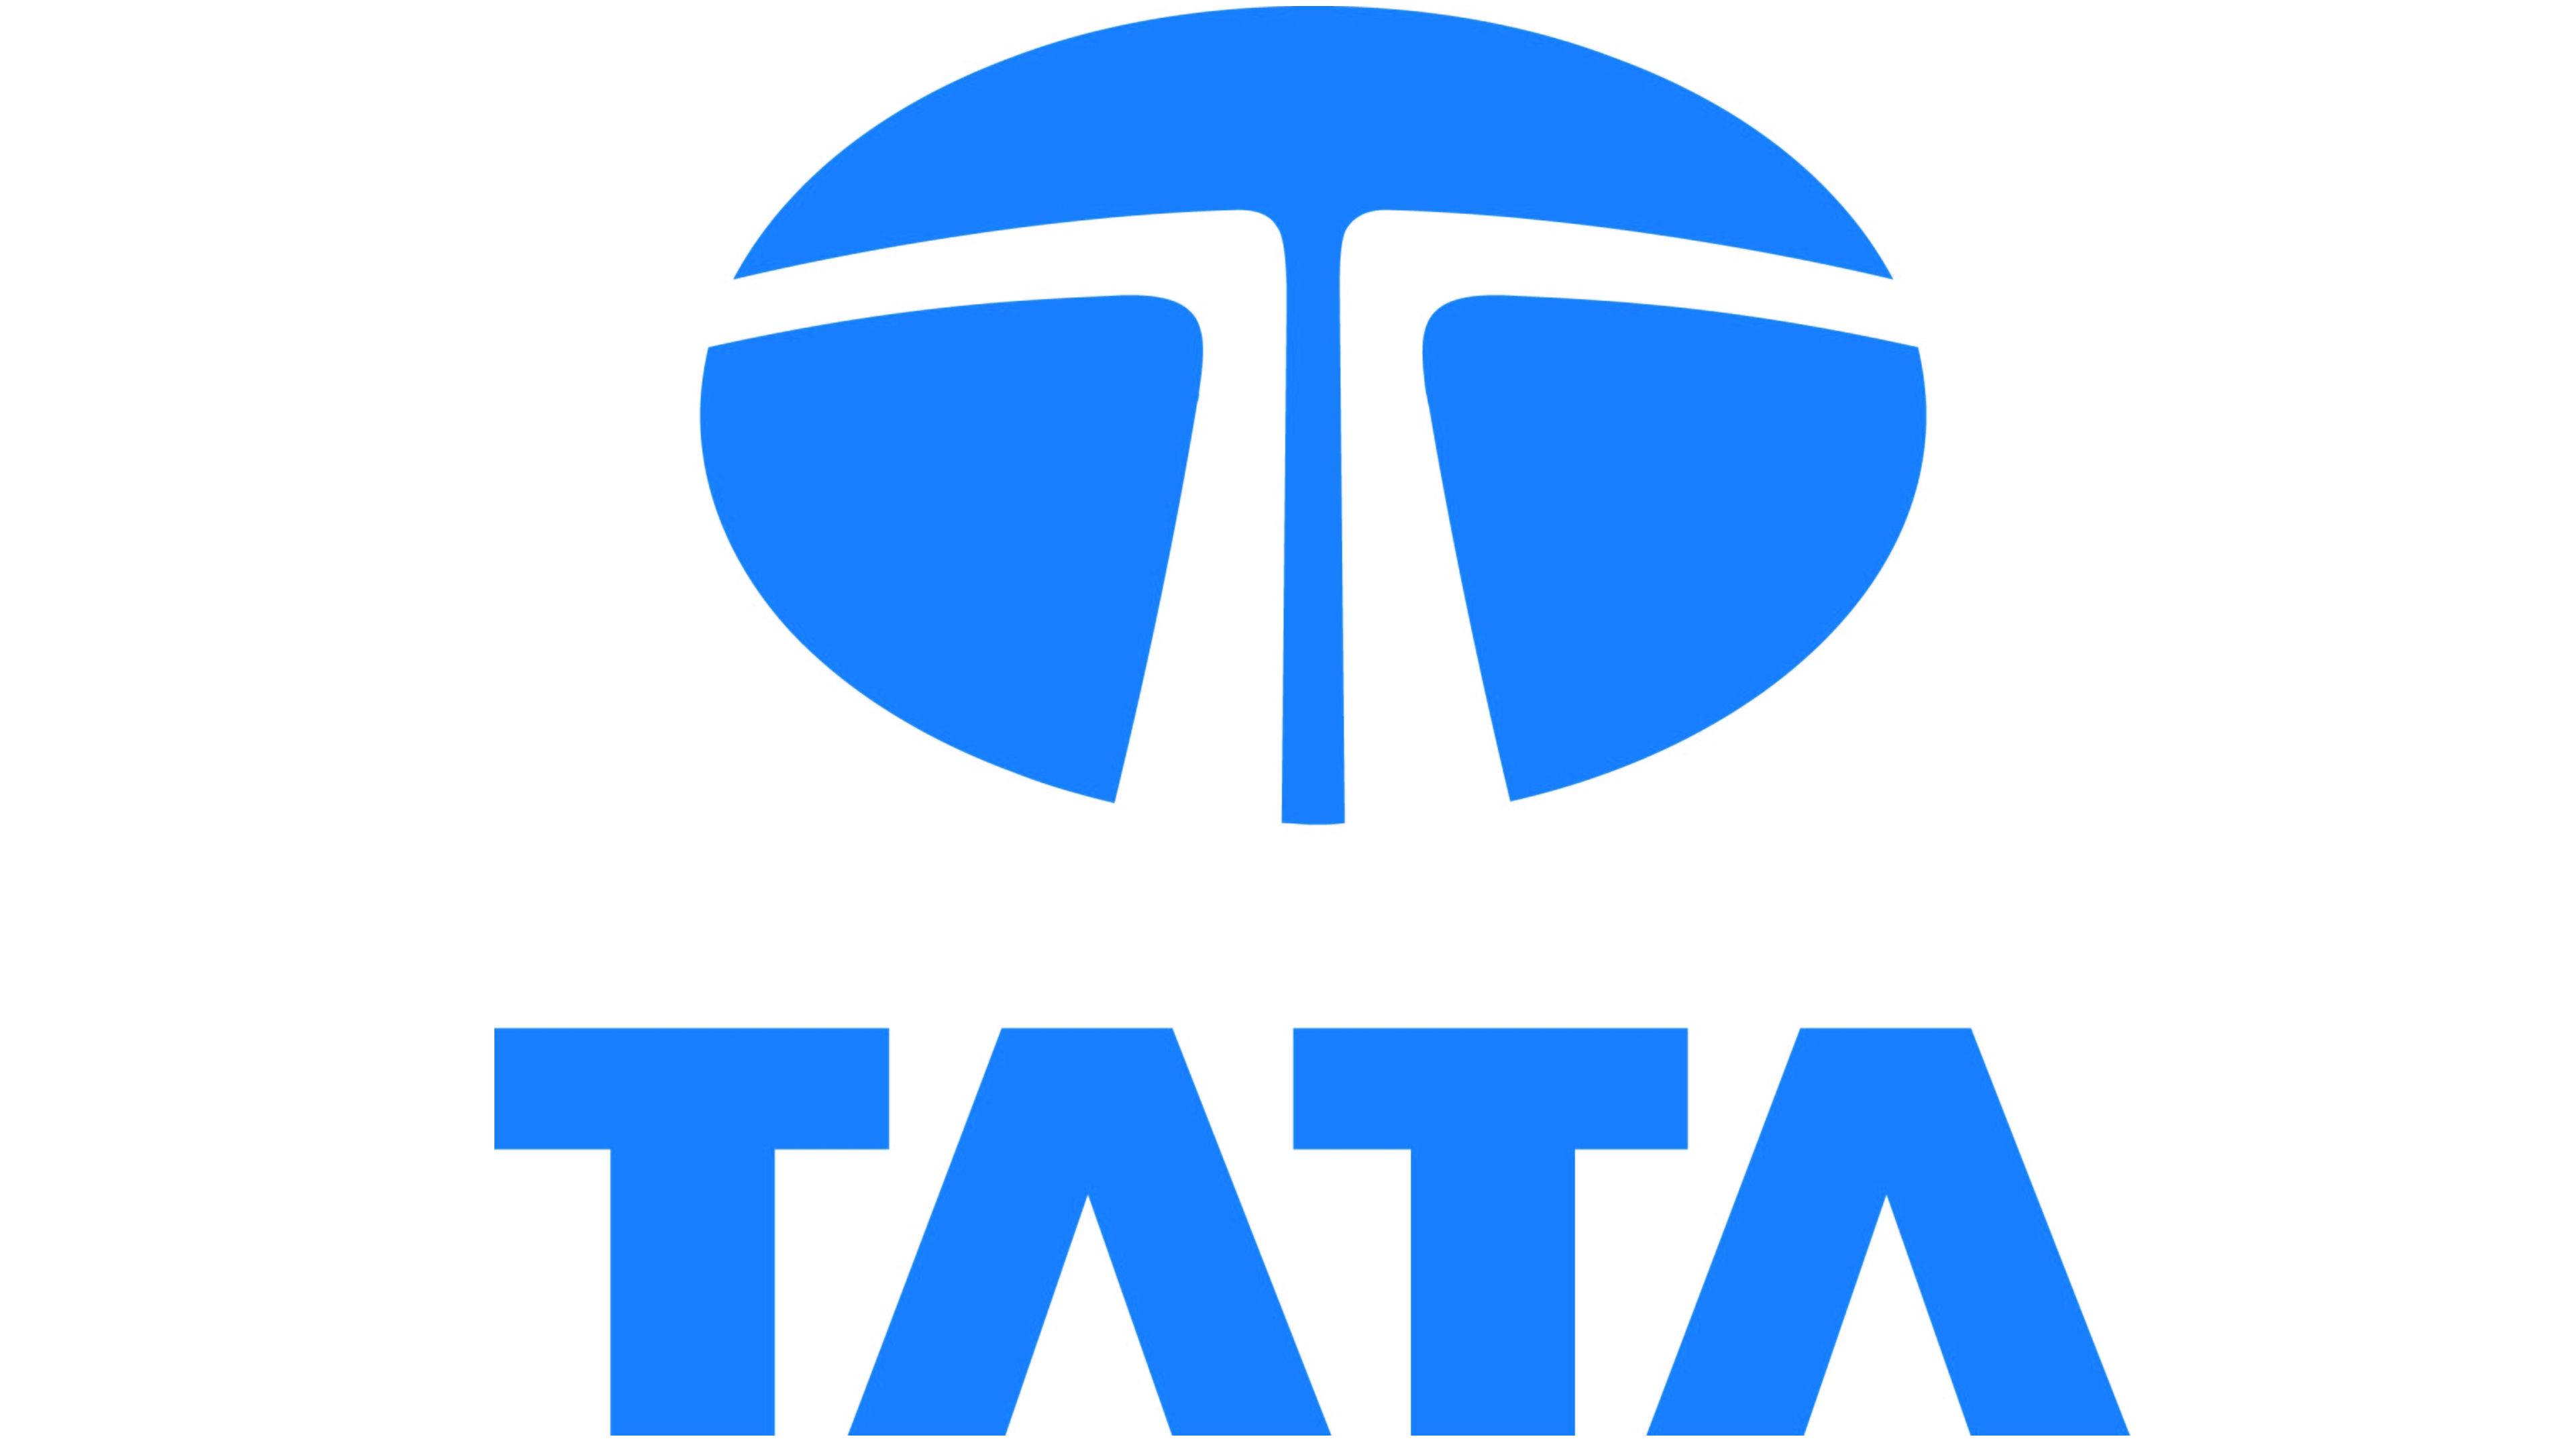 Tata logo wallpapers HD